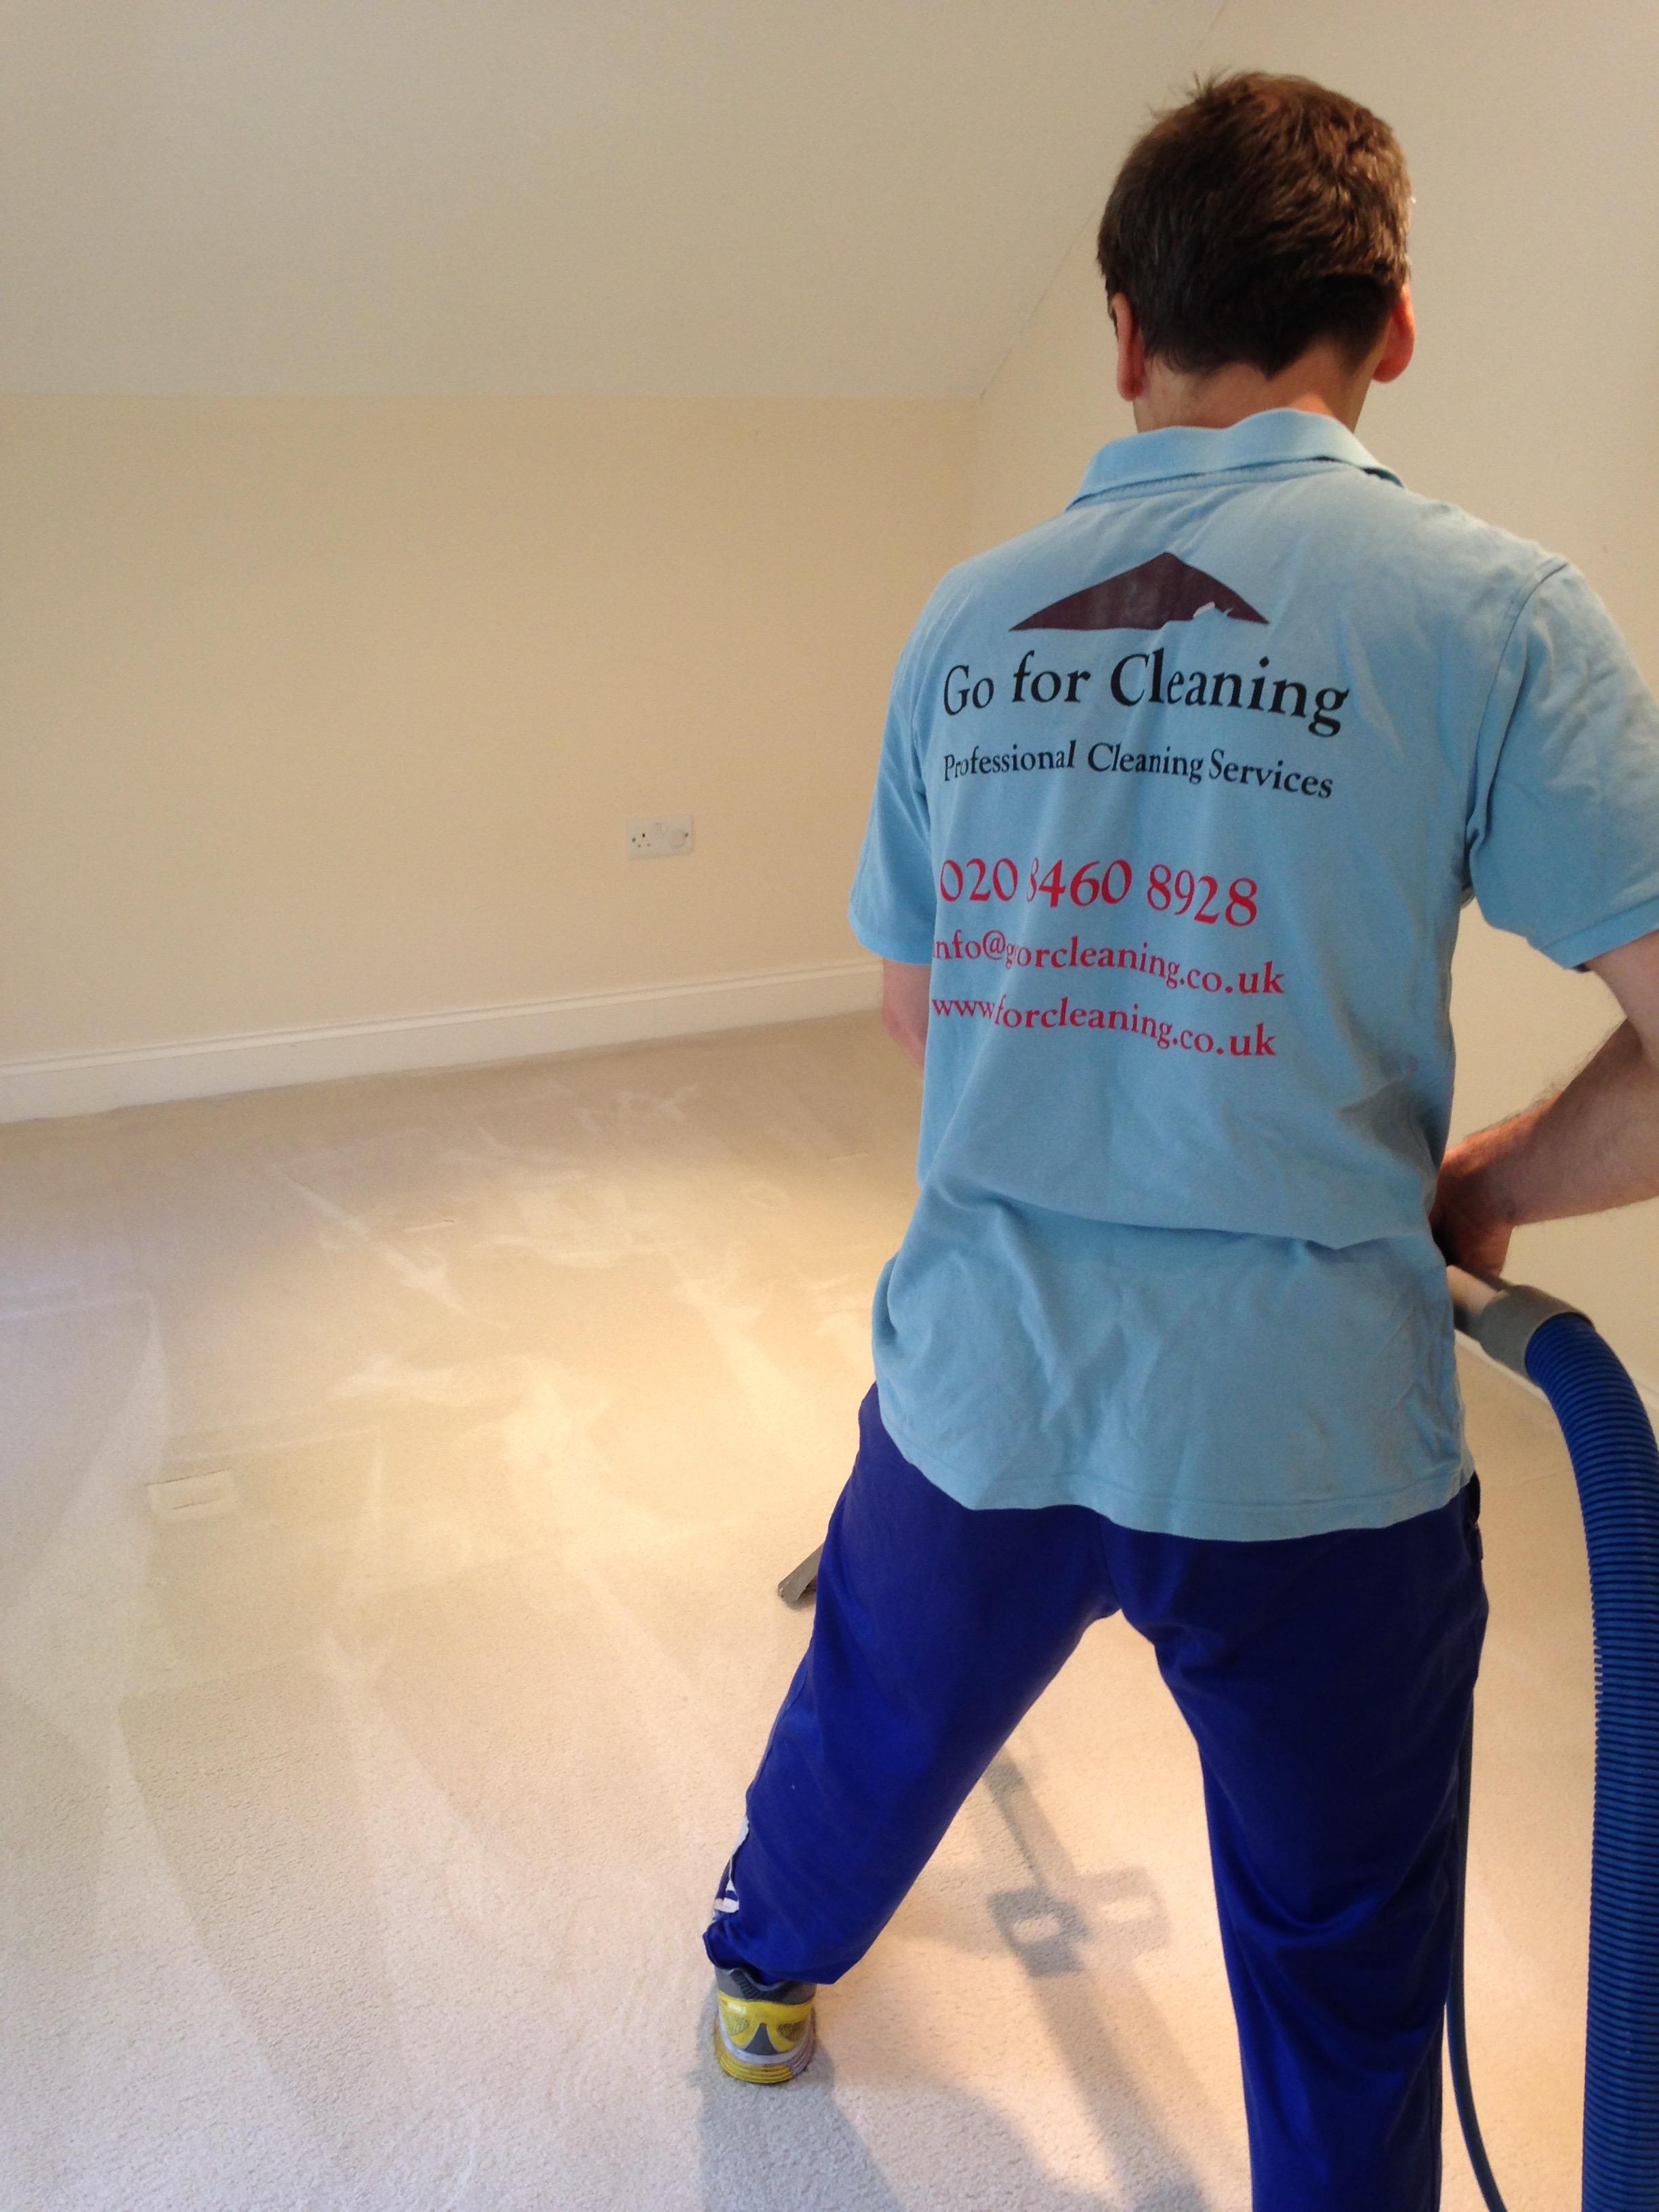 professional carpet cleaner London - Go For Cleaning LTD.jpg